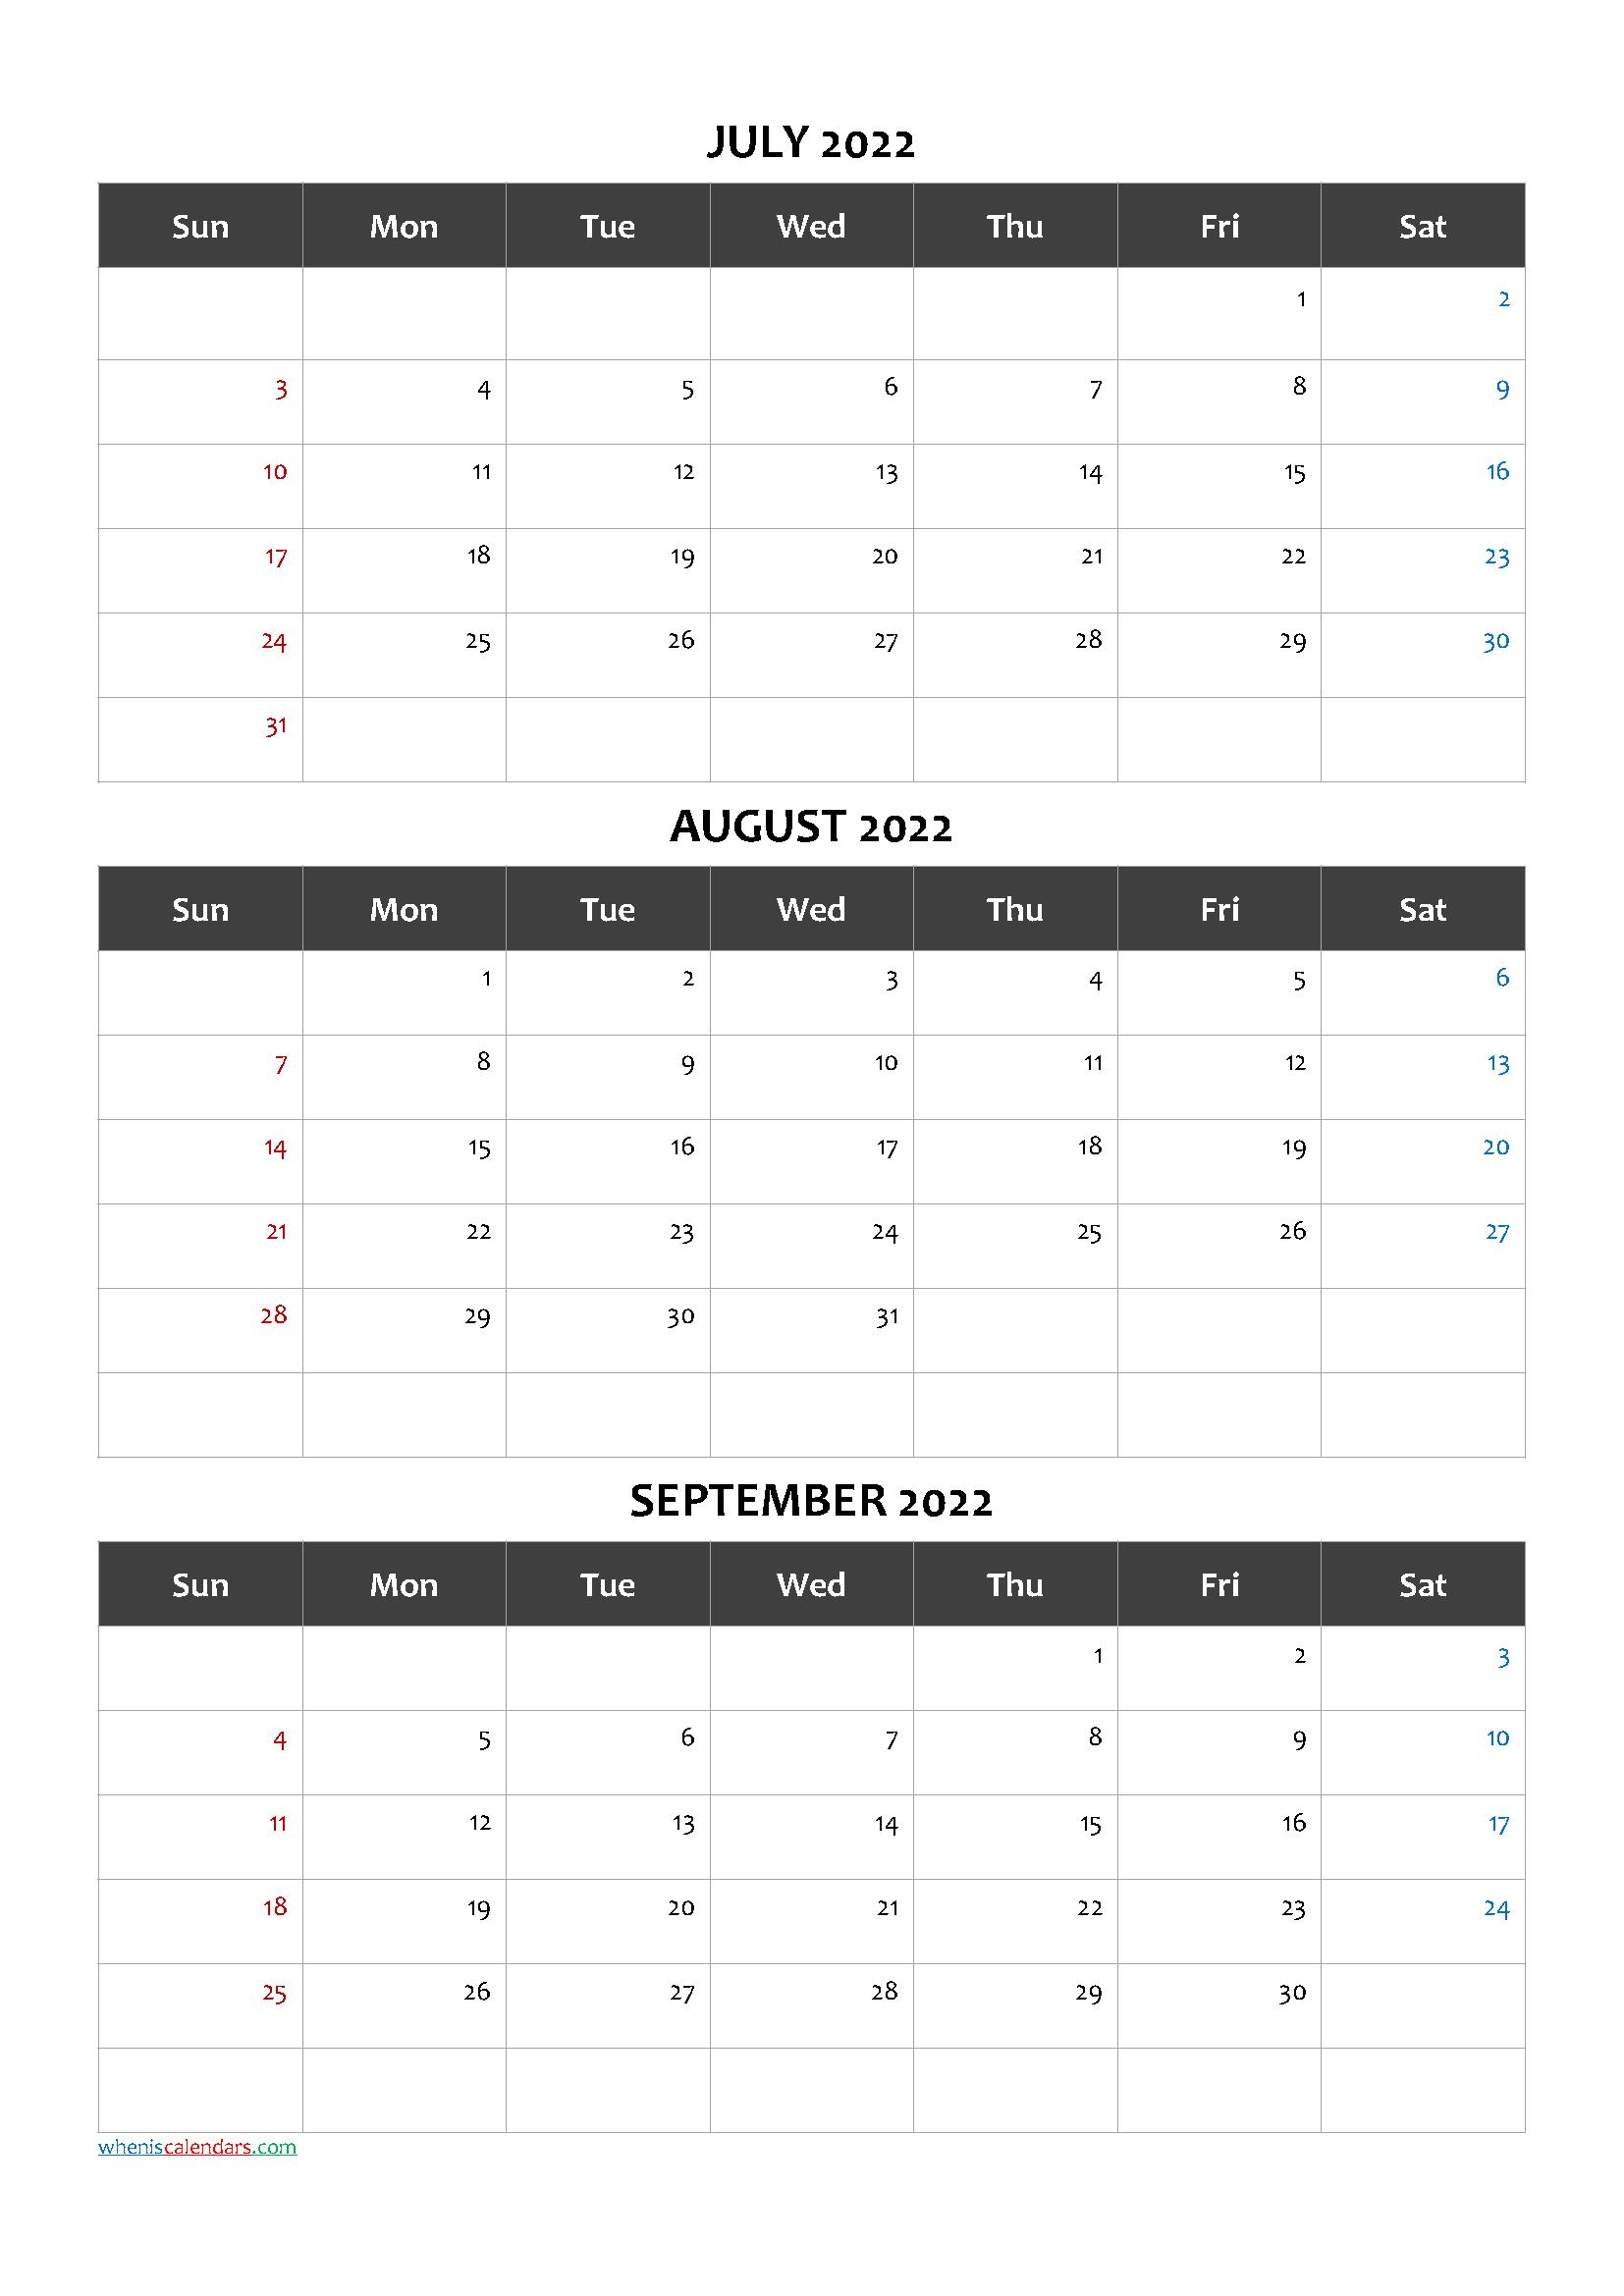 Free Printable 3 Month Calendar2022 July August September